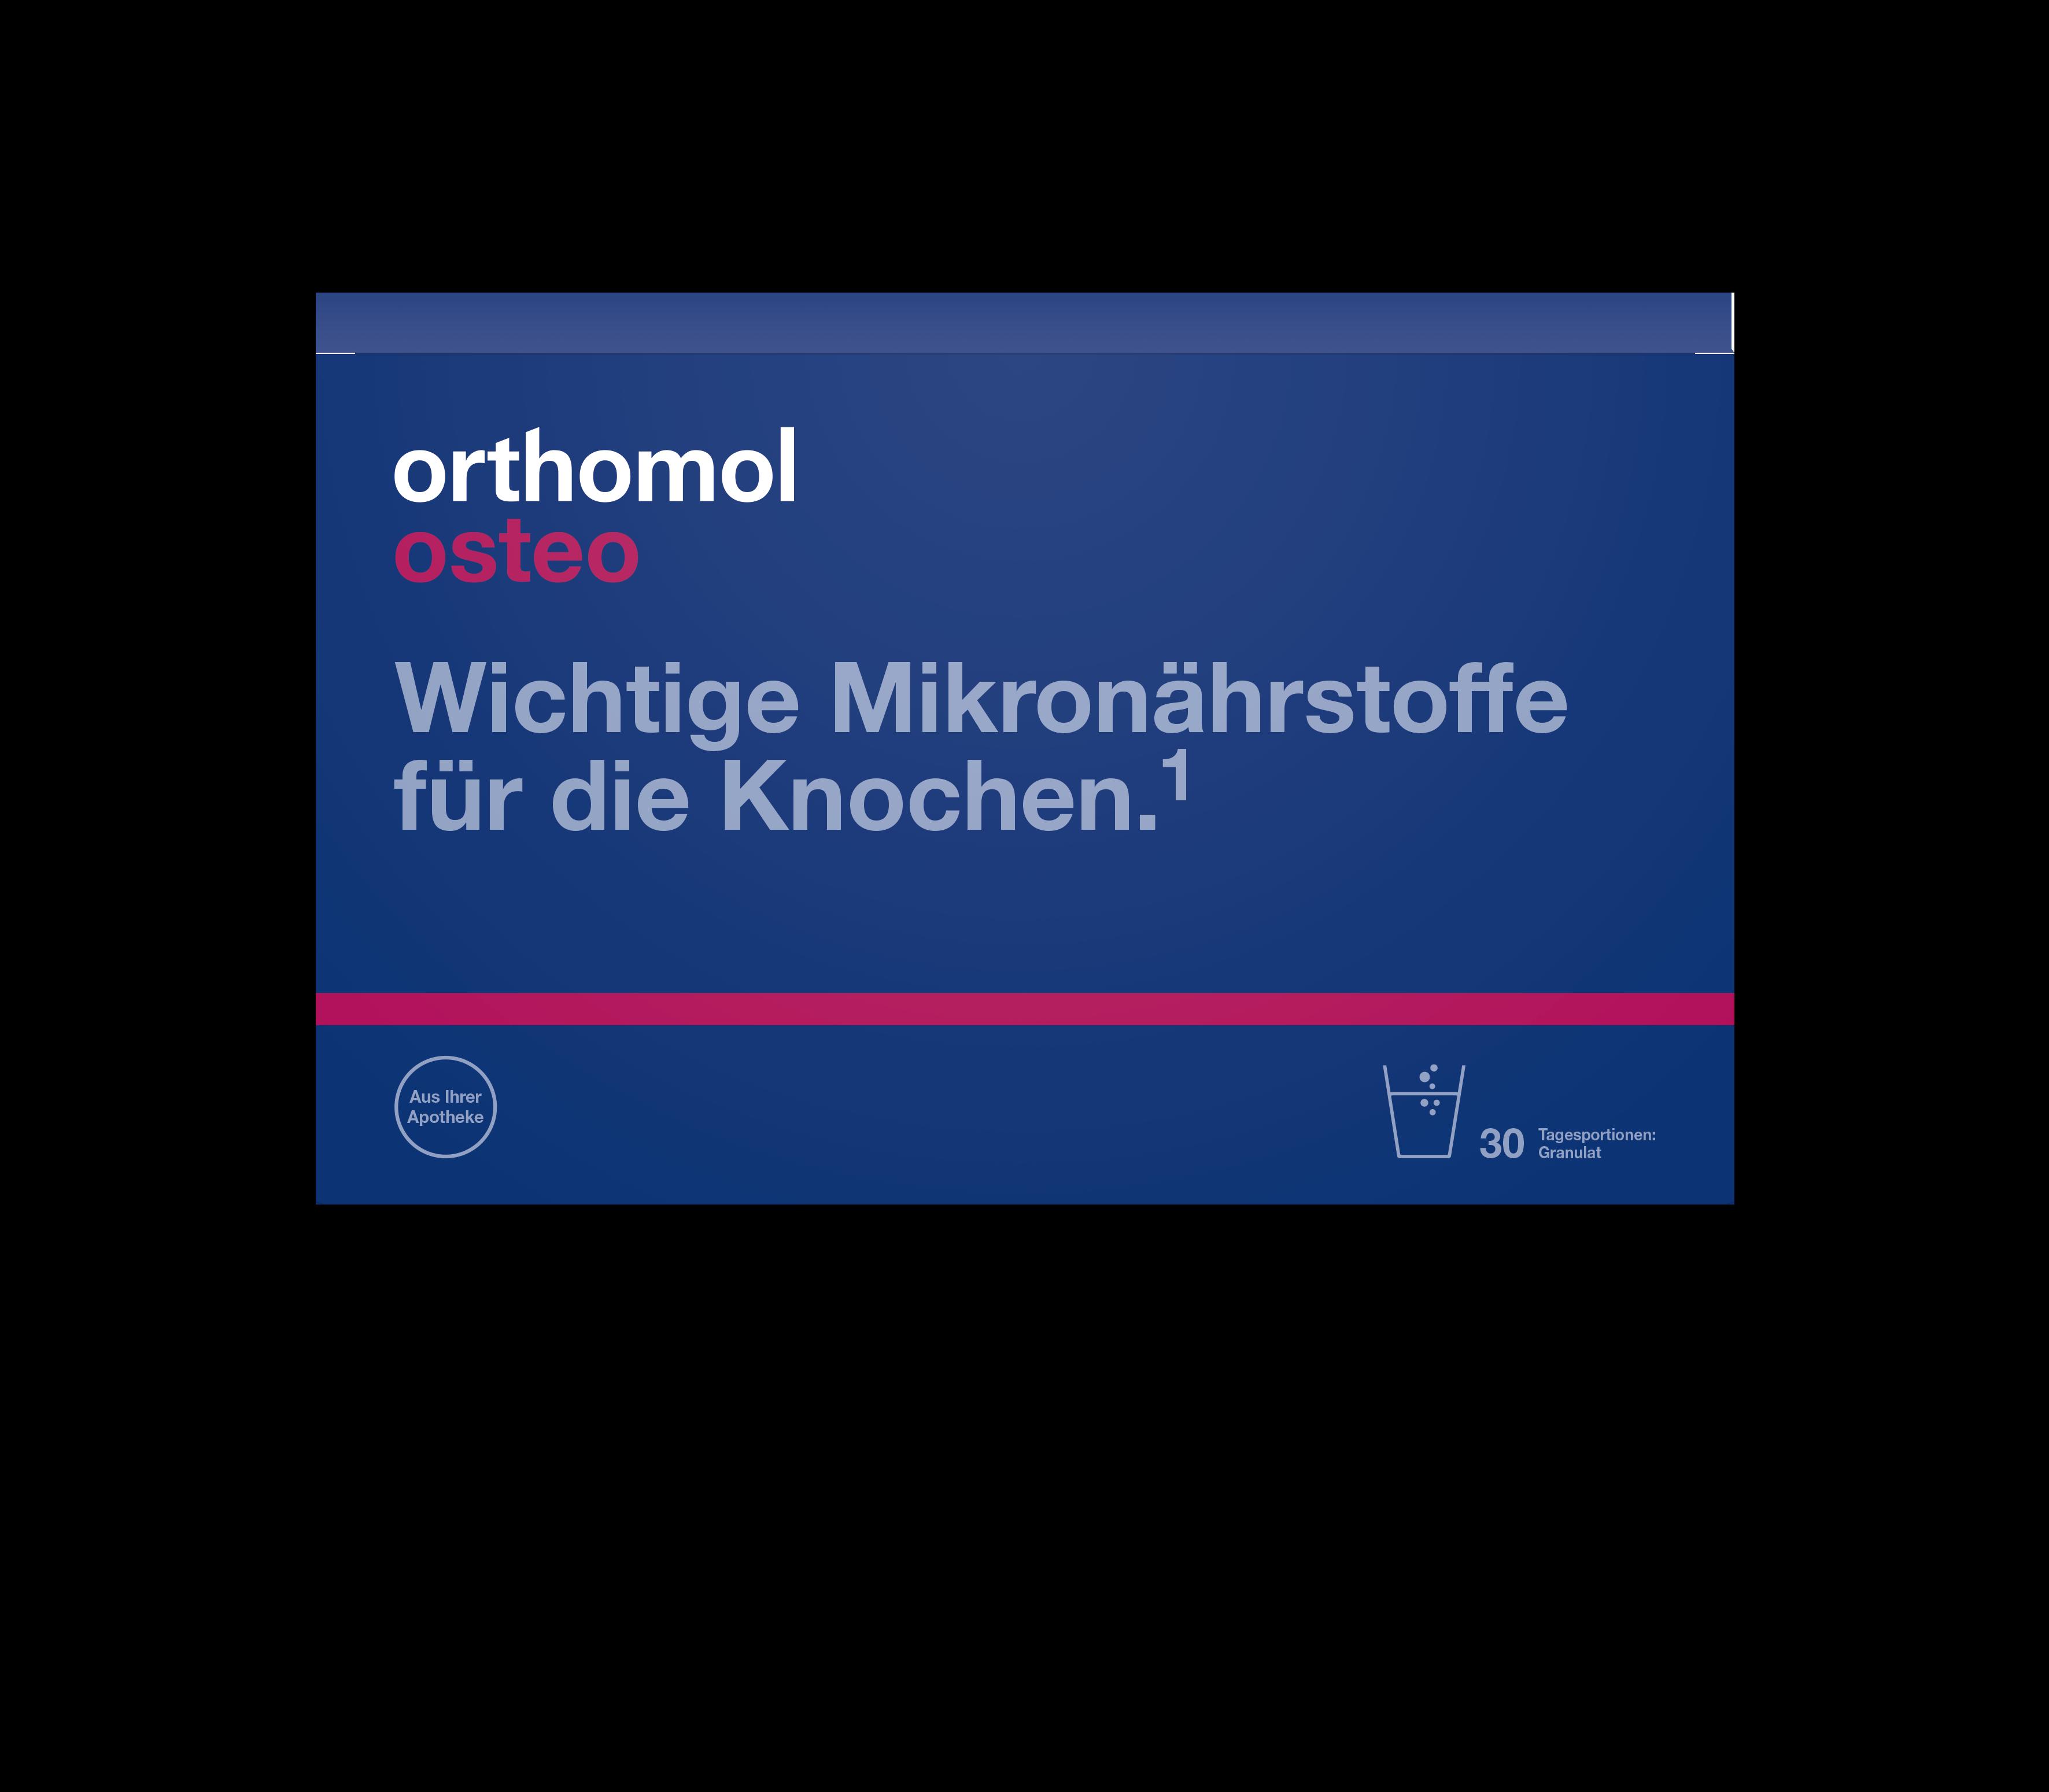 Orthomol Osteo